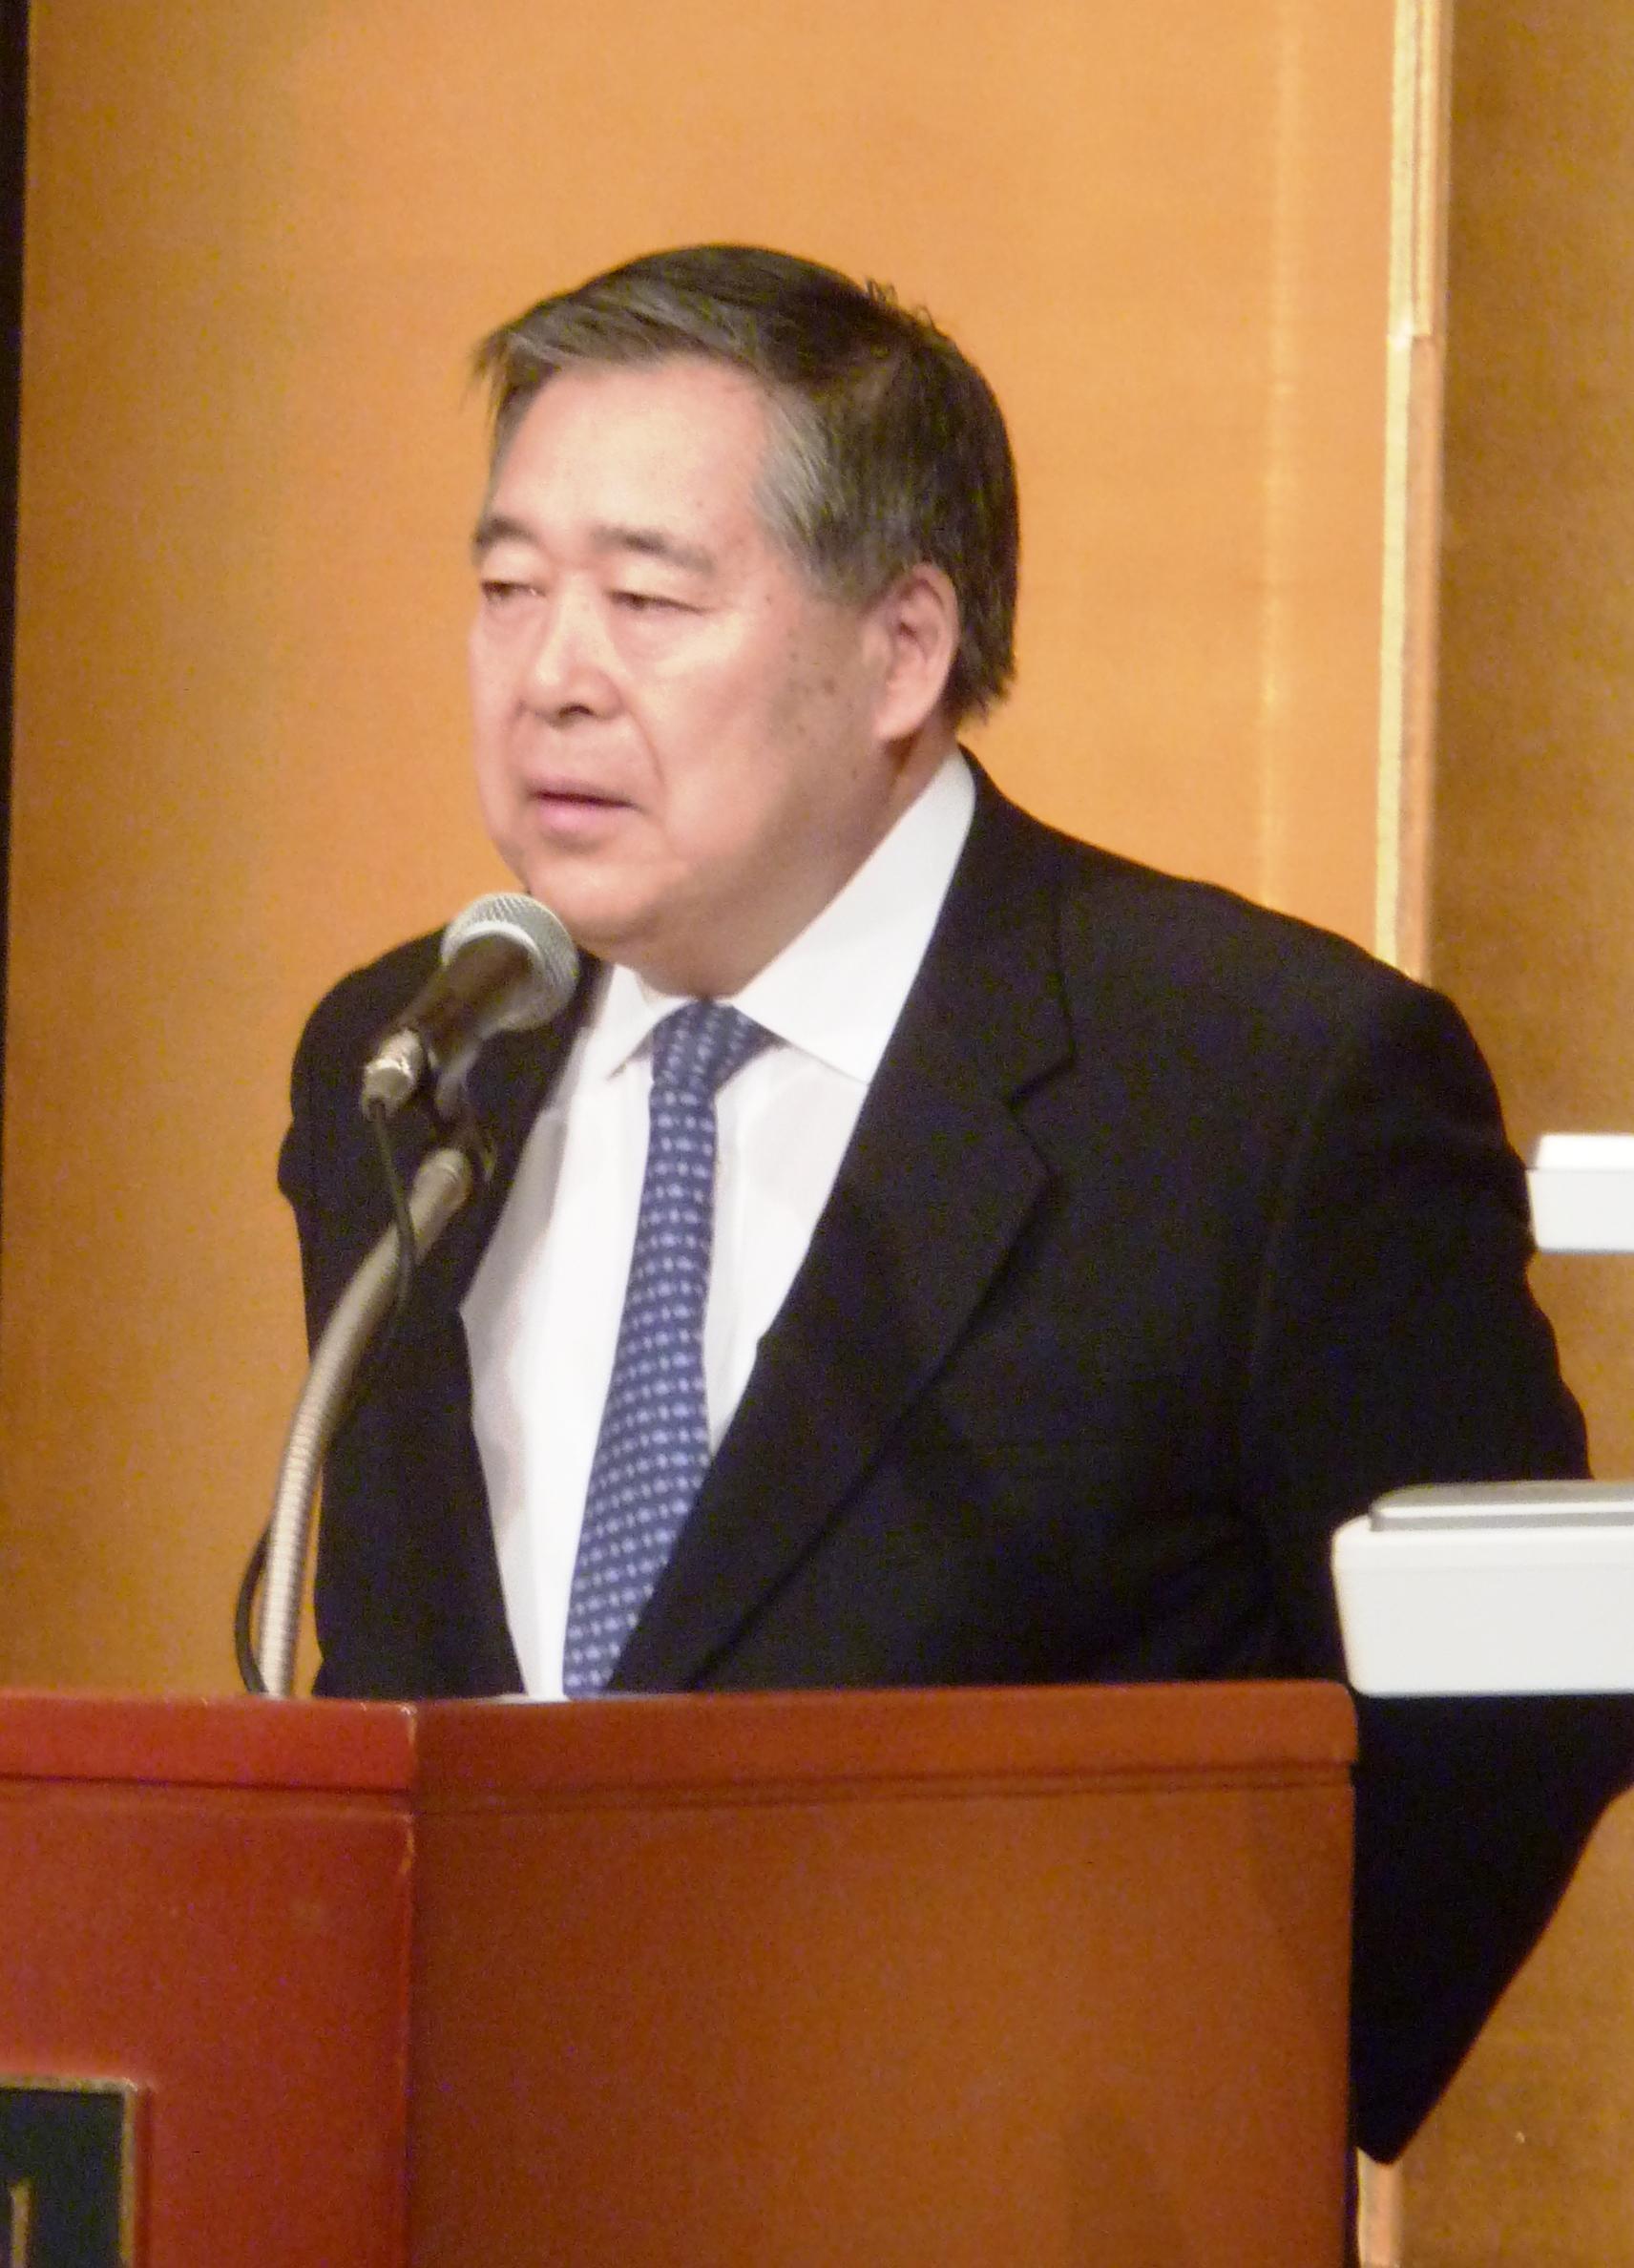 講演する小泉武夫東京農大名誉教授